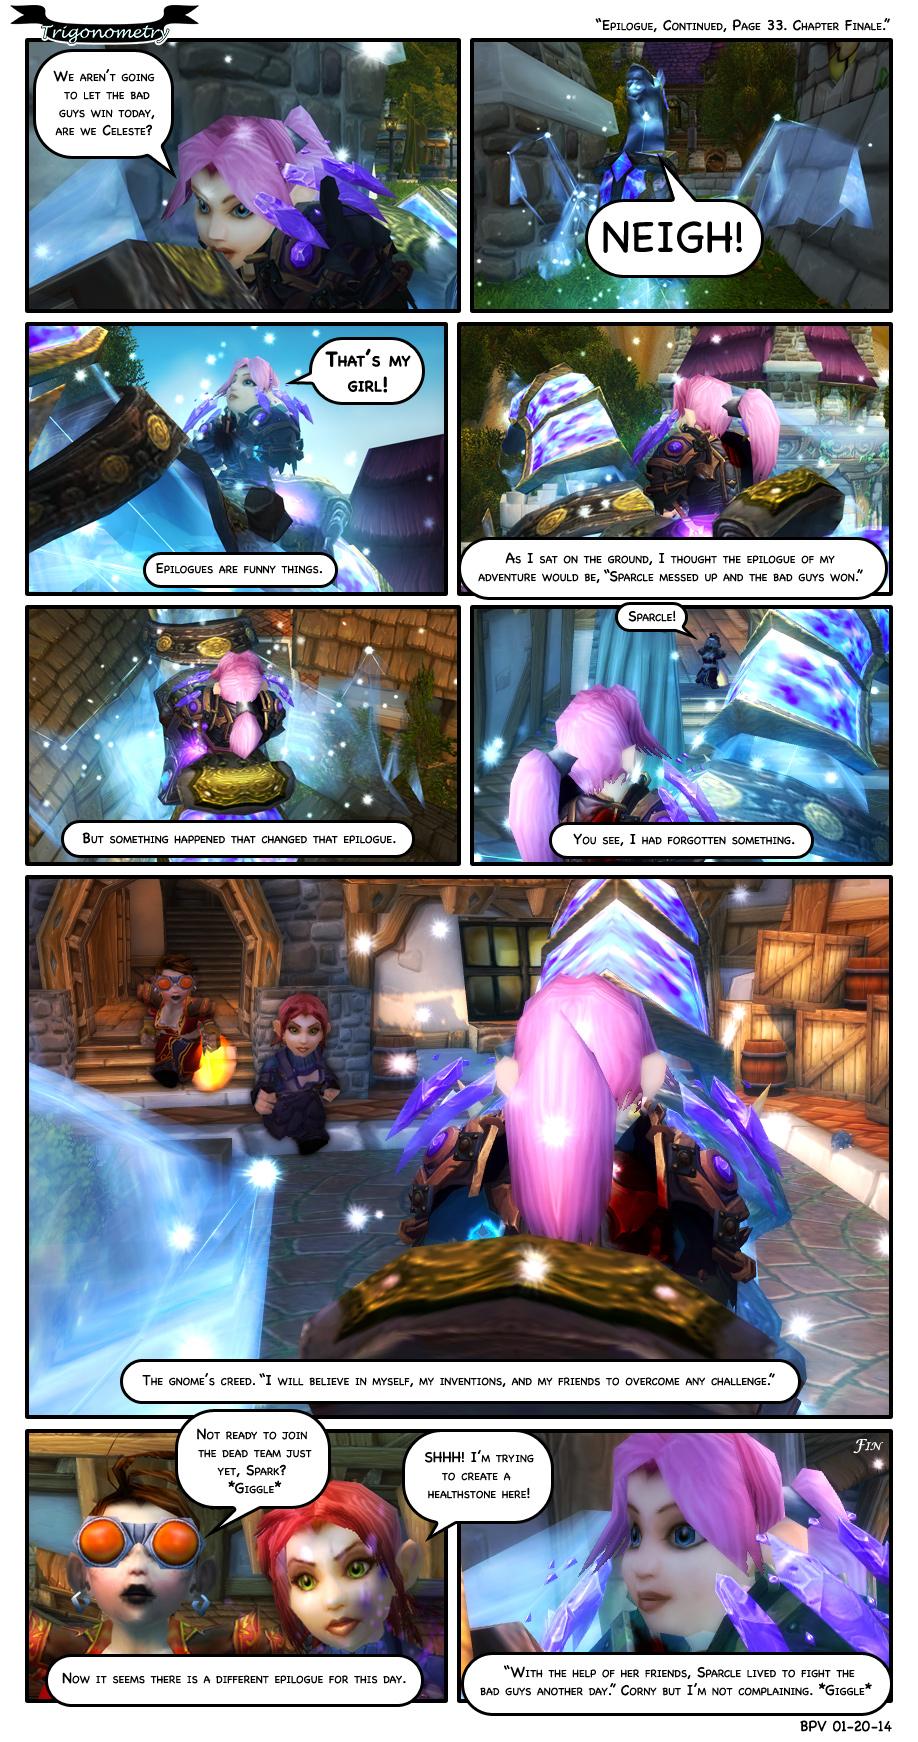 Epilogue, Continued. Page 33